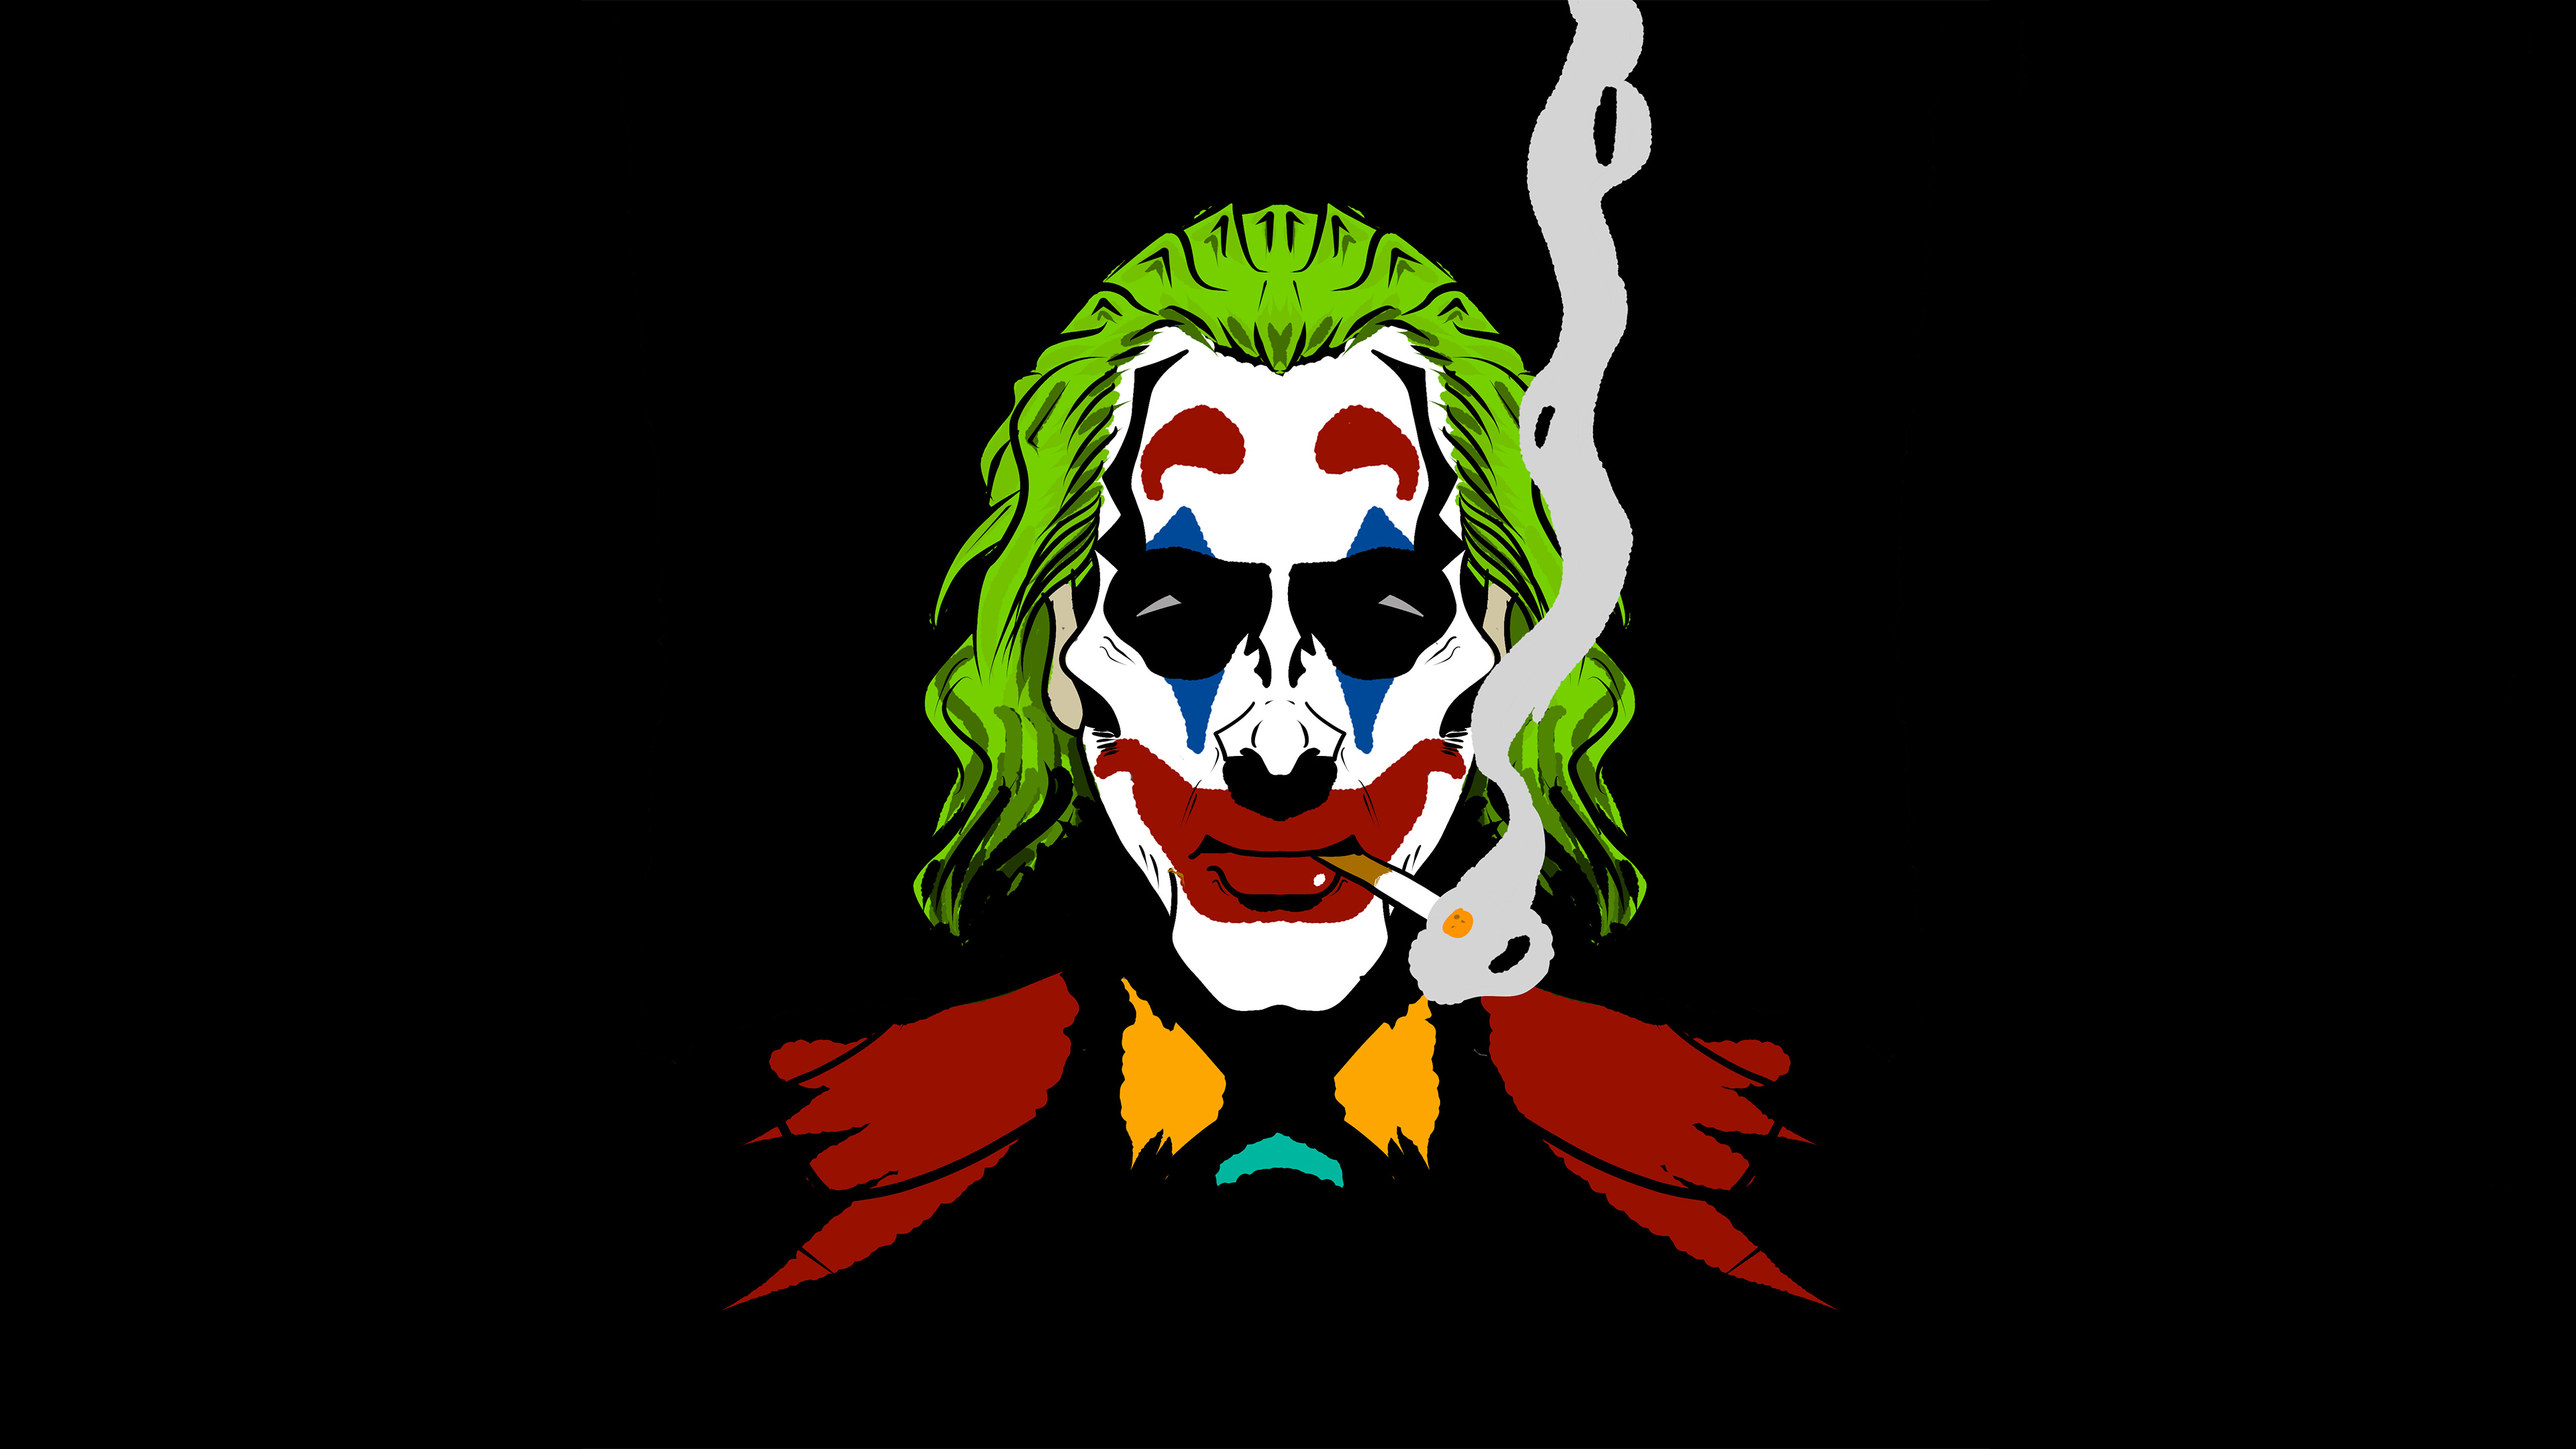 Joker Smoking Wallpaper Hd Minimalist 4k Wallpapers Images